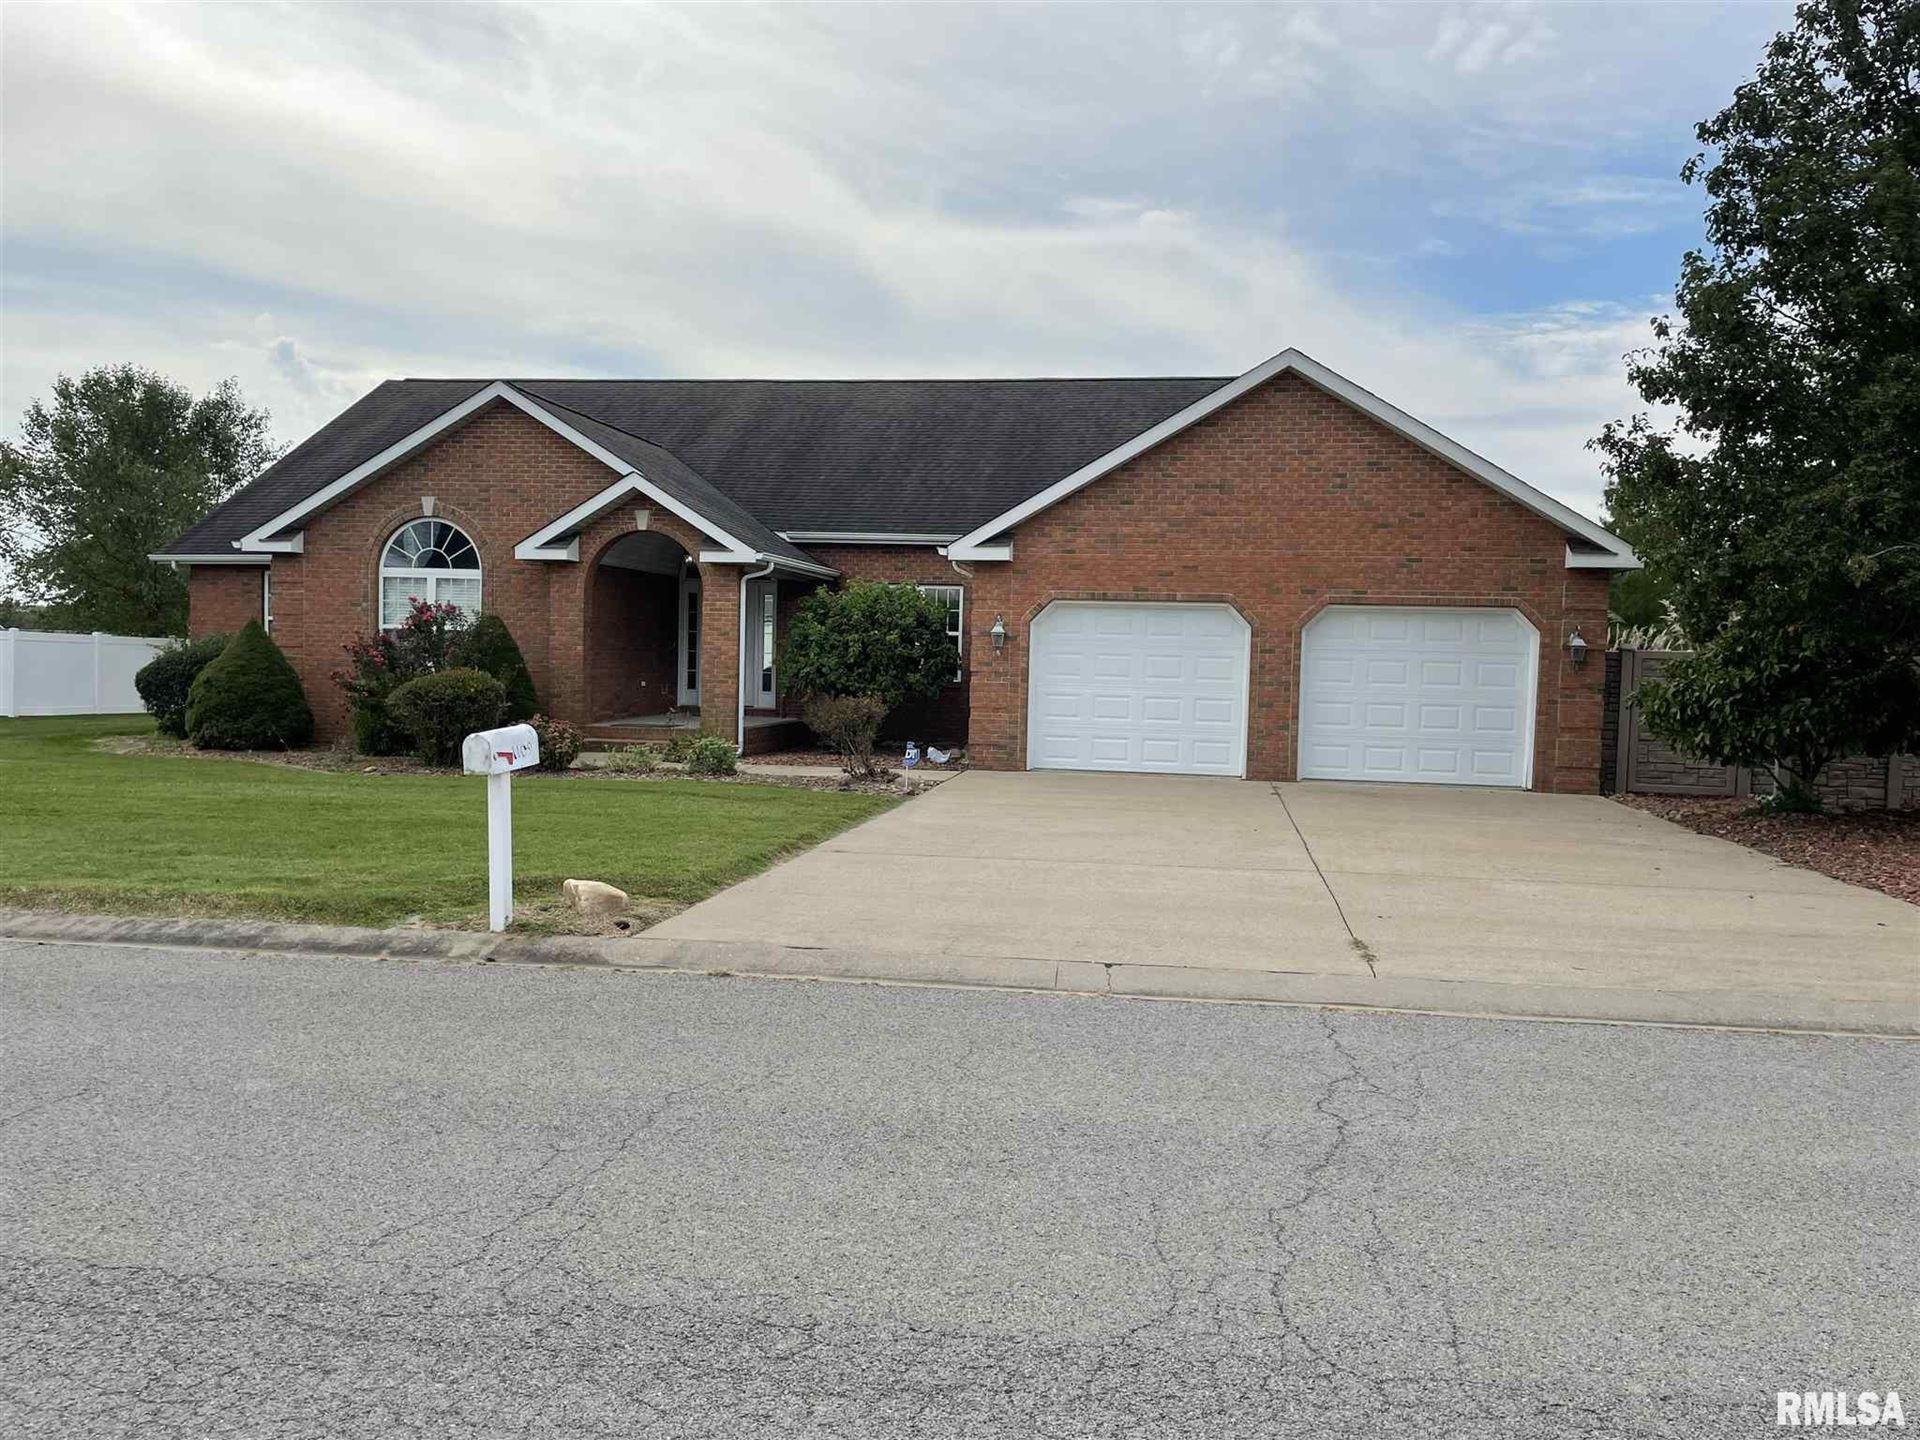 1109 Folgers, Marion, IL 62959 - MLS#: EB441607